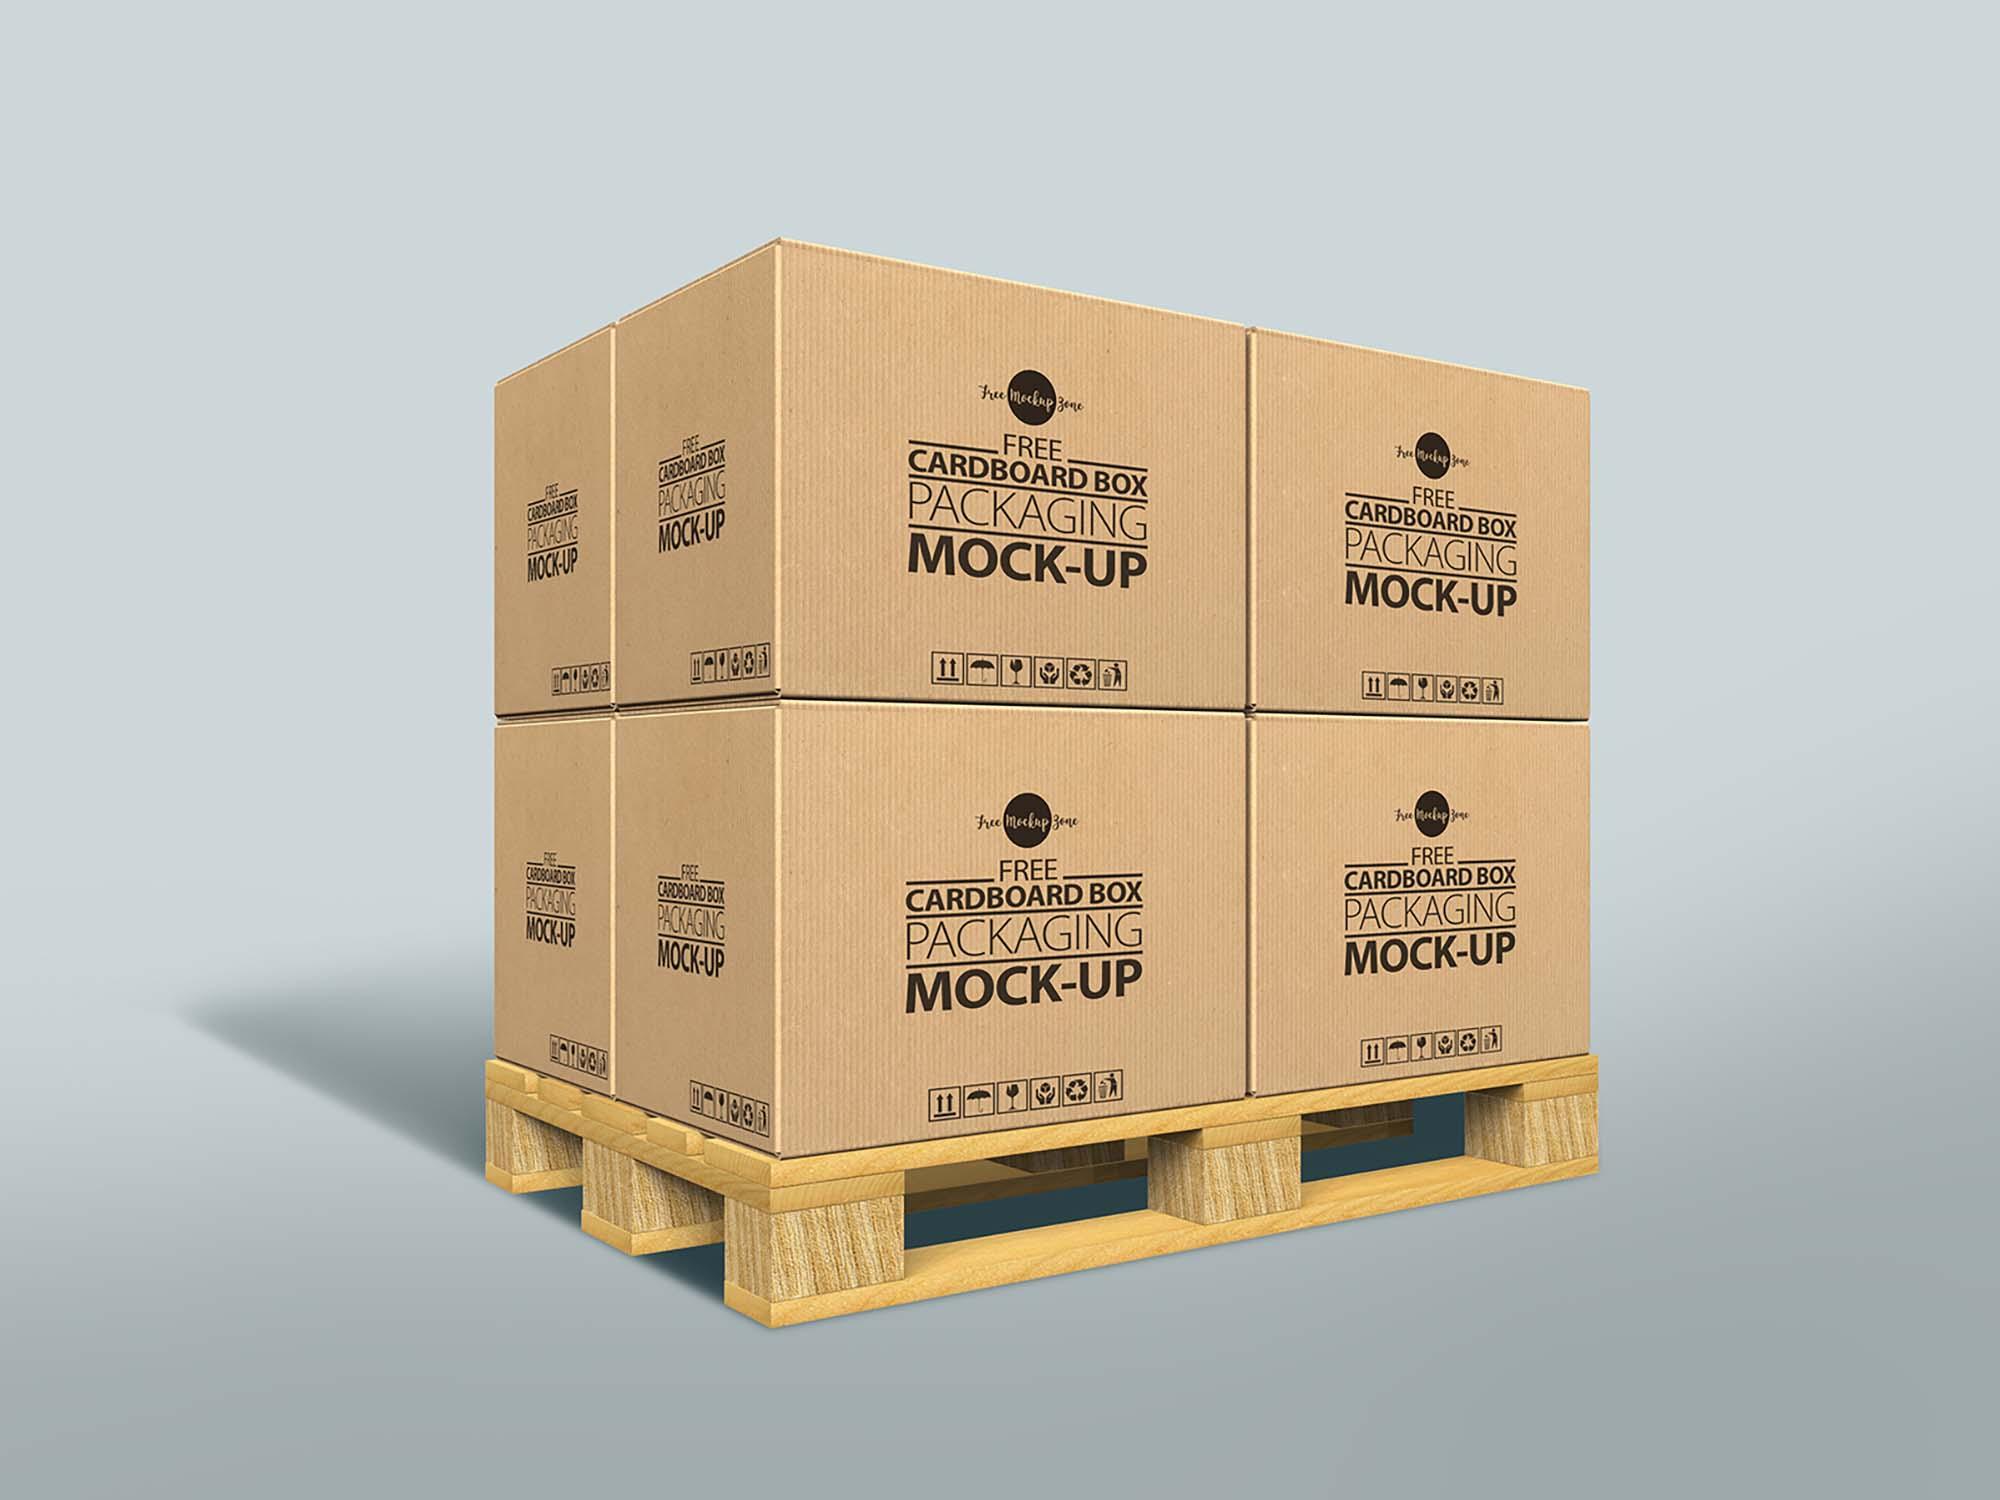 Cardboard Box Packaging Mockup